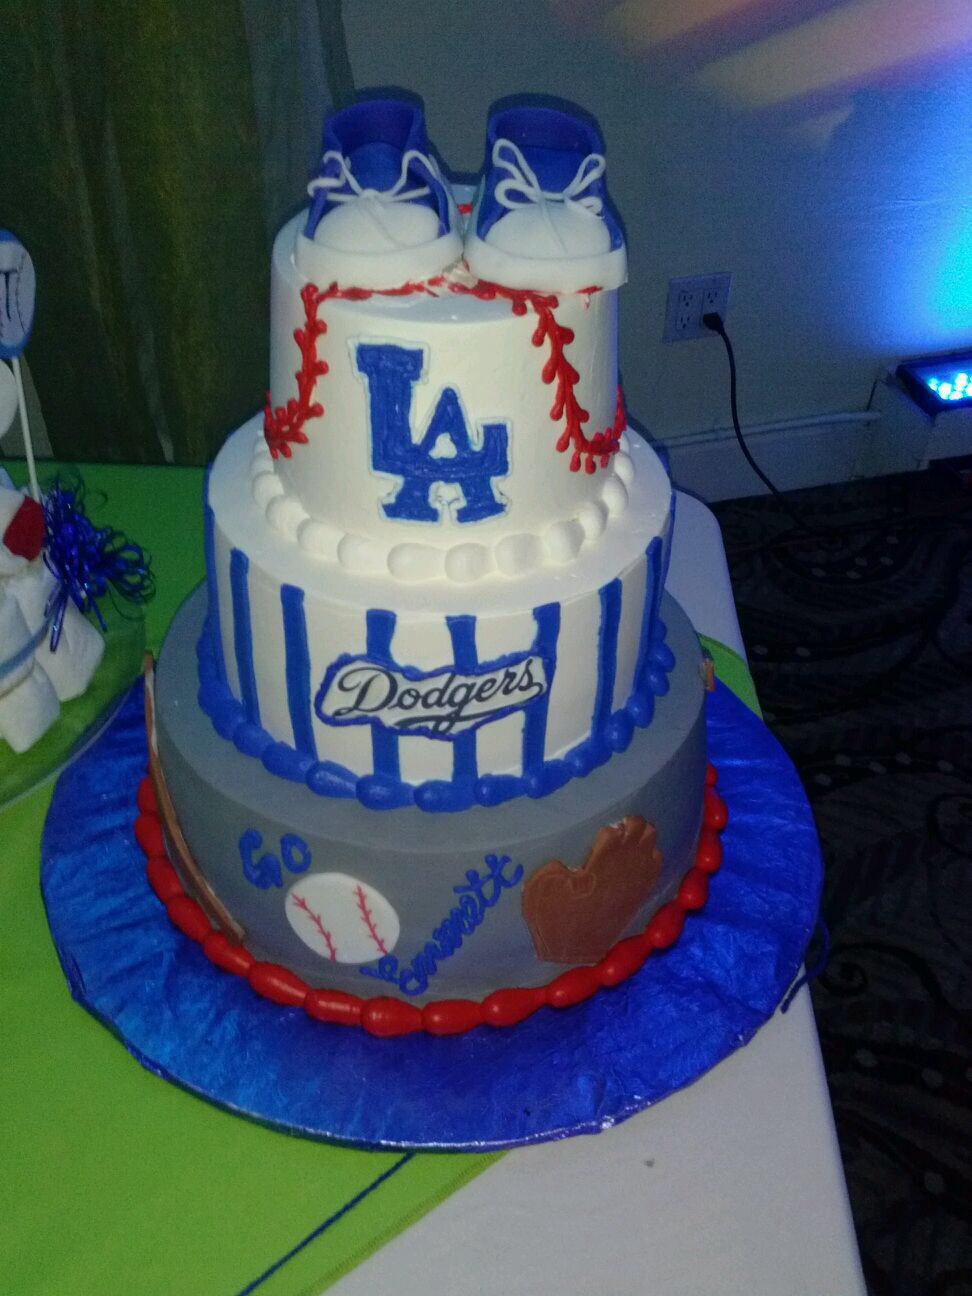 Dodgers Baby Shower Cake